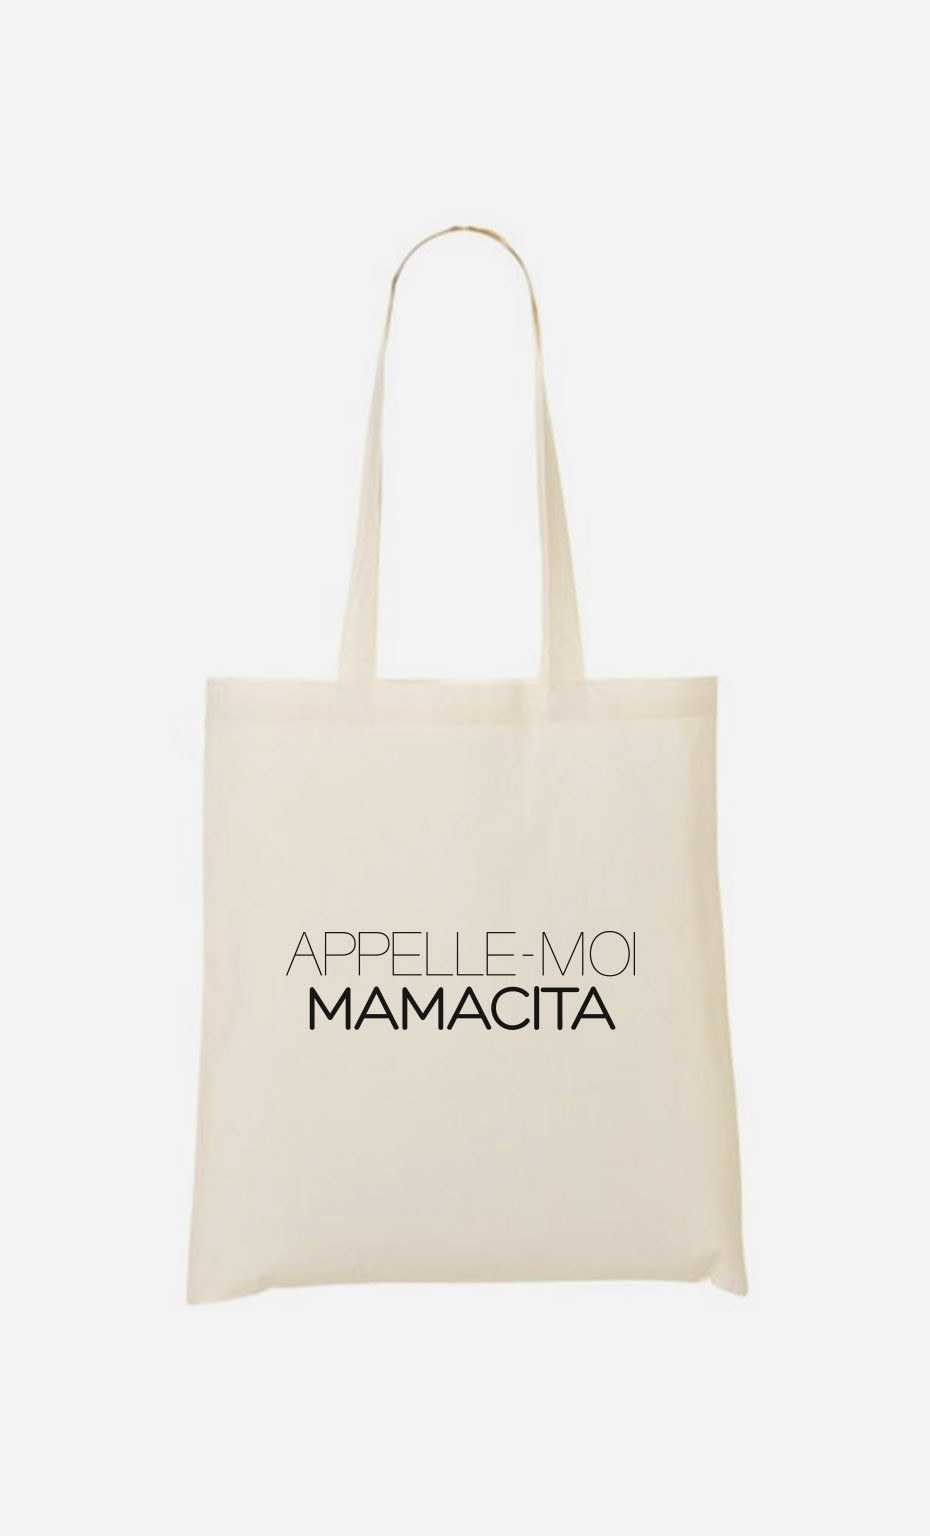 Tote Bag Appelle-Moi Mamacita